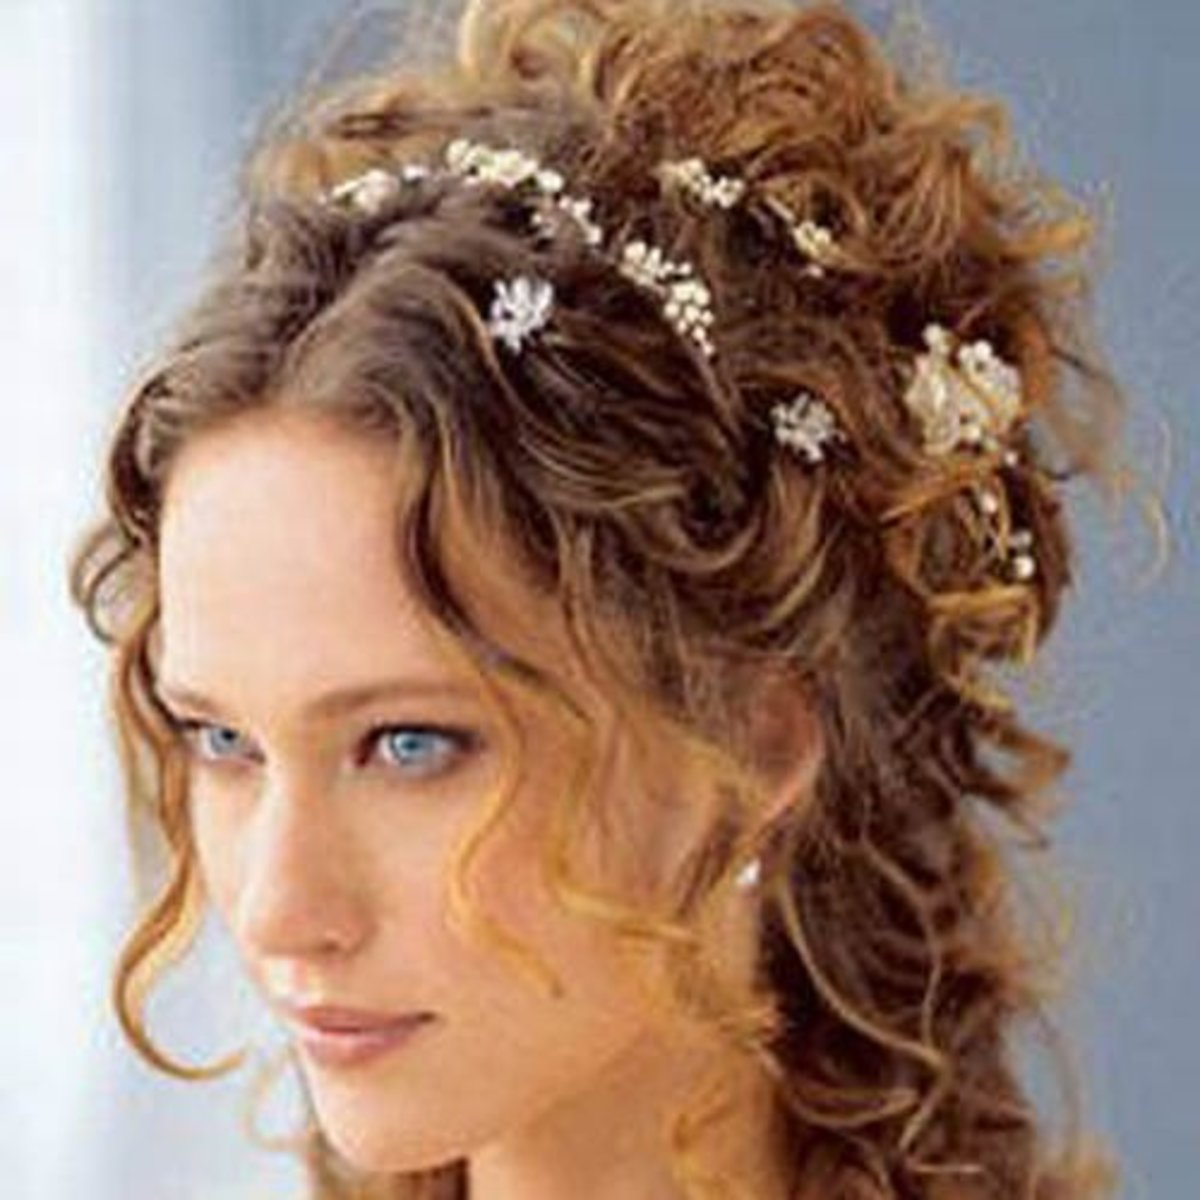 Swell Hair Styles Of Ancient Rome Short Hairstyles Gunalazisus